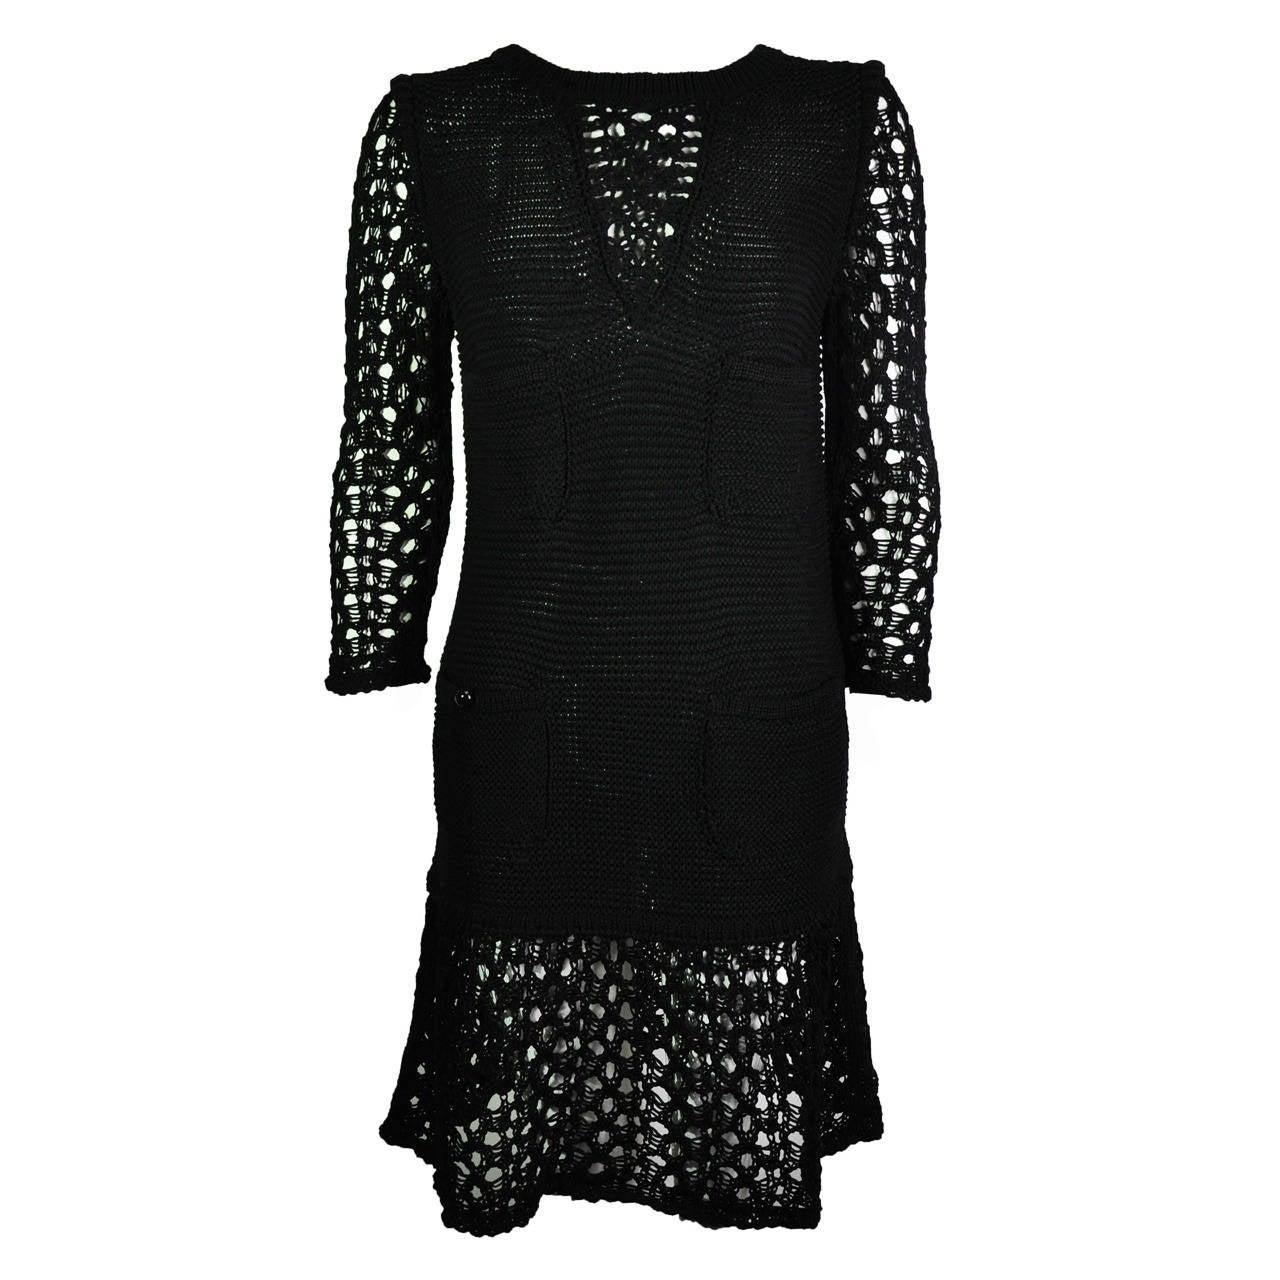 Chanel 2014 Resort Black Open-knit Cotton Dress FR36 New 1